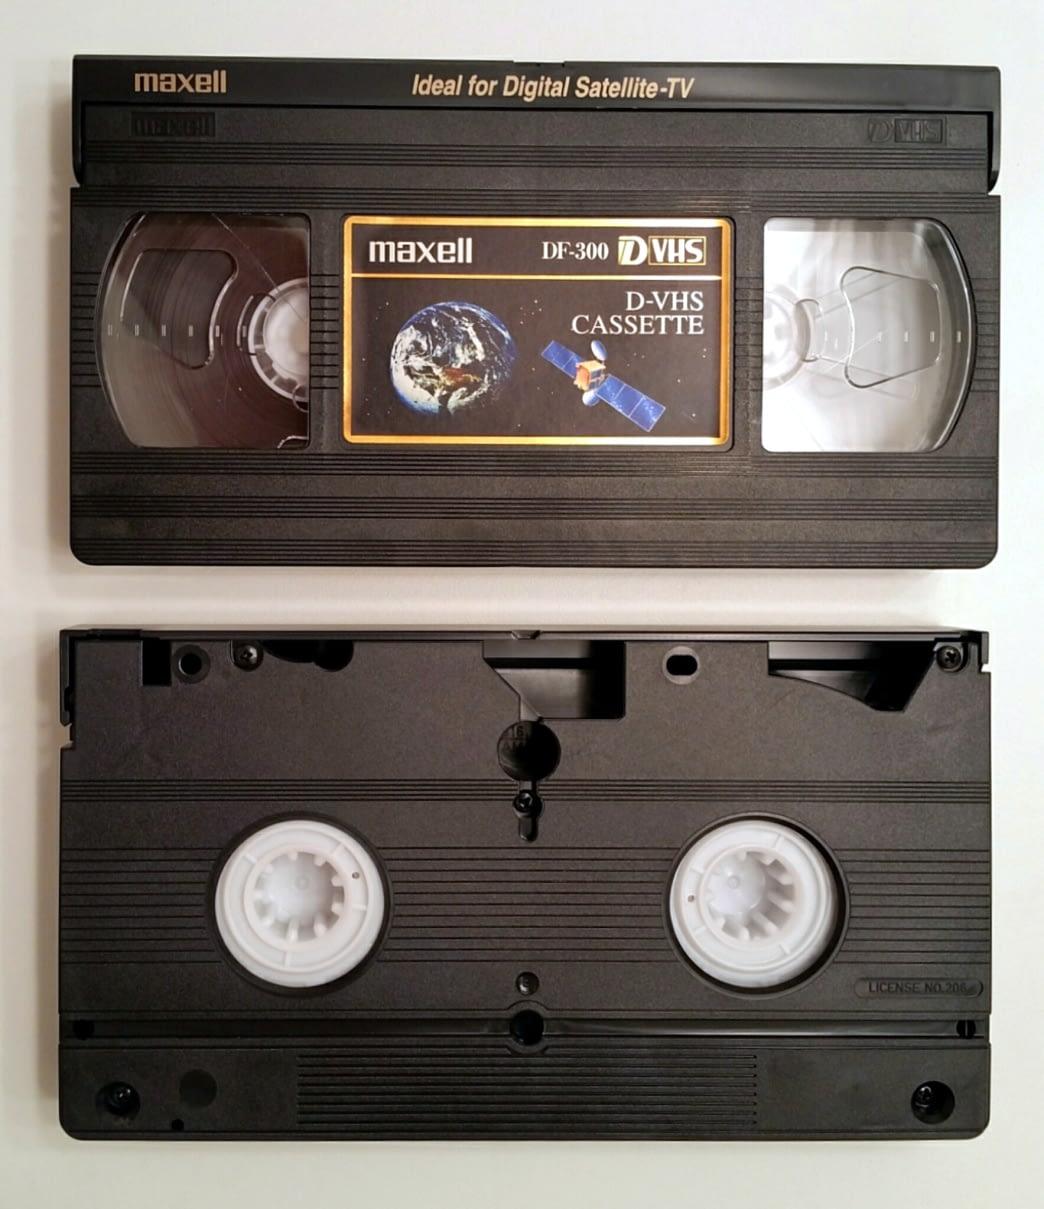 Cassette D-VHS (digital VHS)